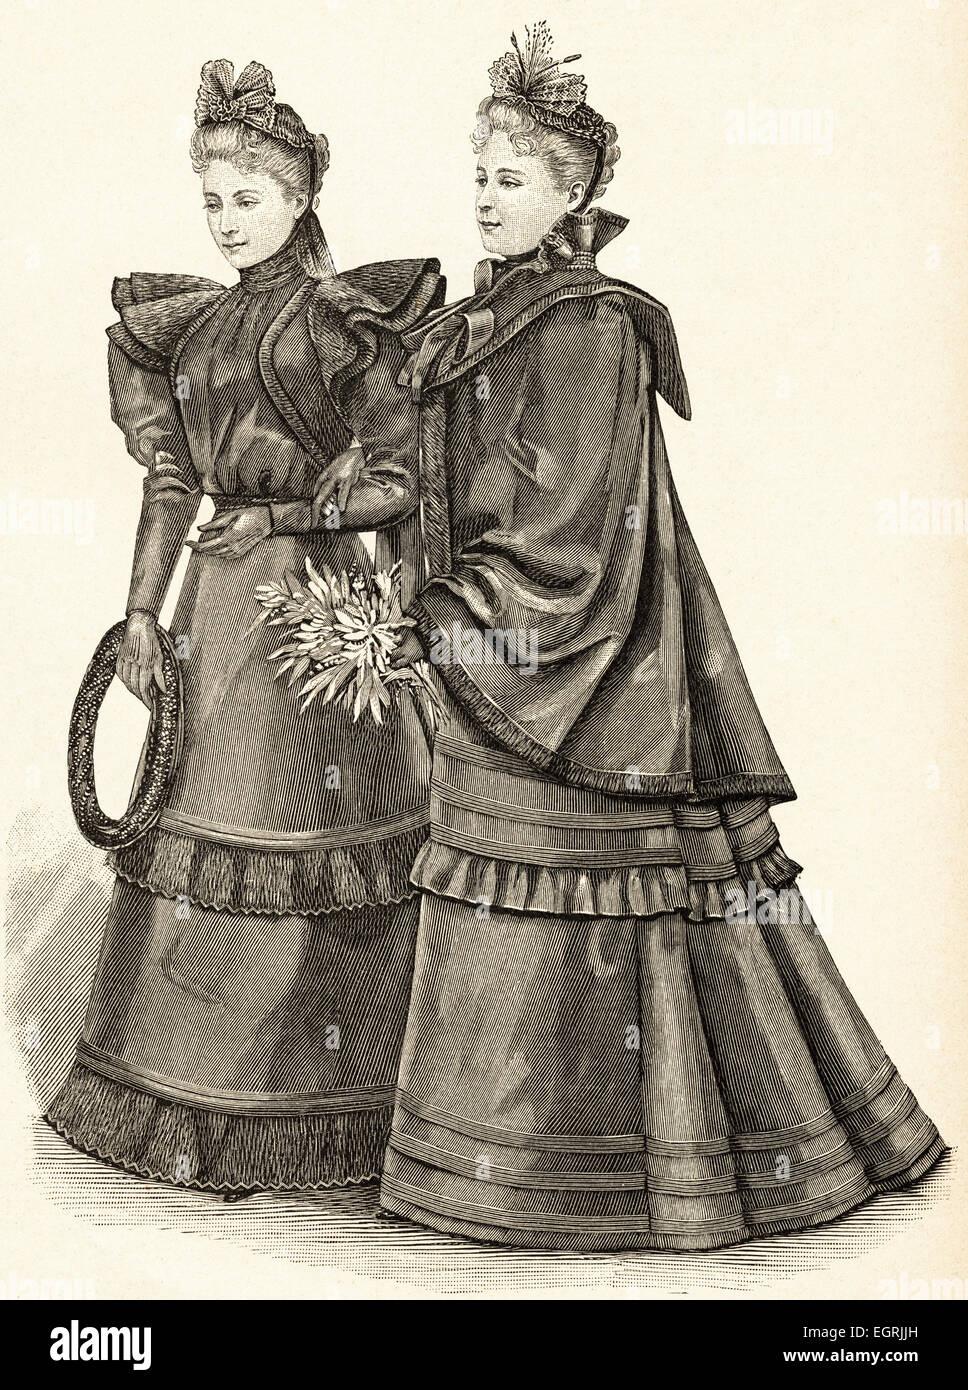 6bb1860bddb05 Victorian Woman Stock Photos & Victorian Woman Stock Images - Alamy